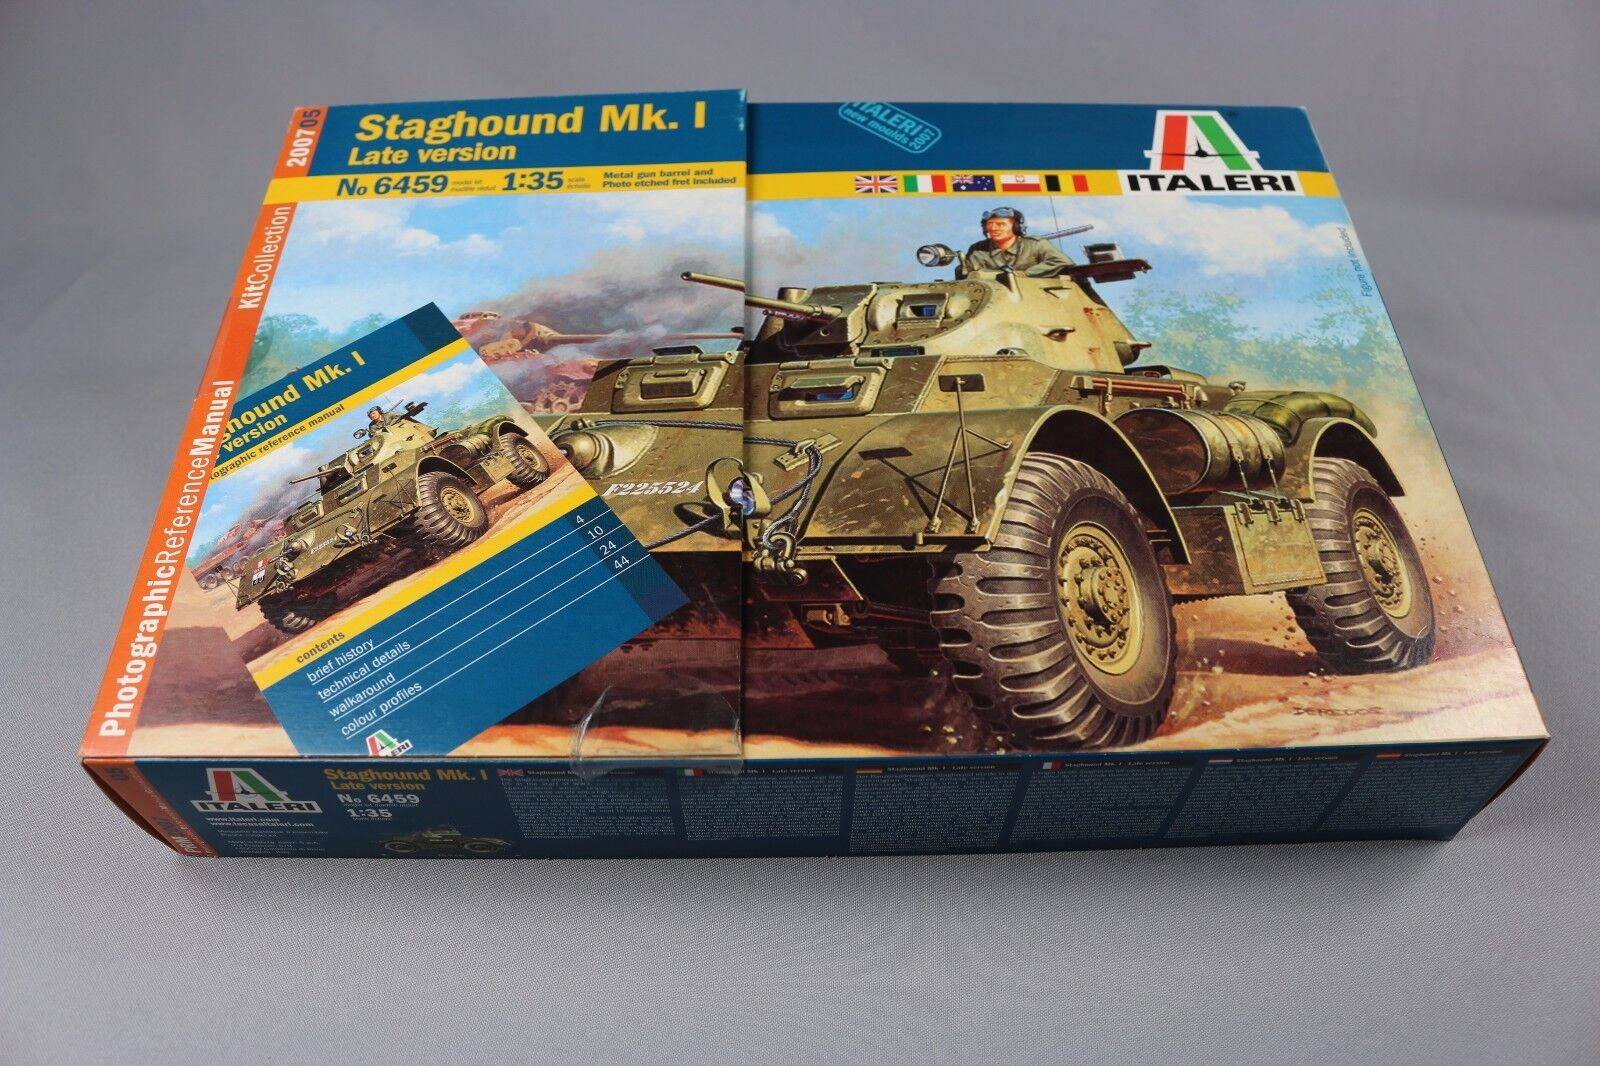 ZC049 Italeri 6459 Maquette Chars Tank 1 35 Staghound Mk. 1 Late Version 2007